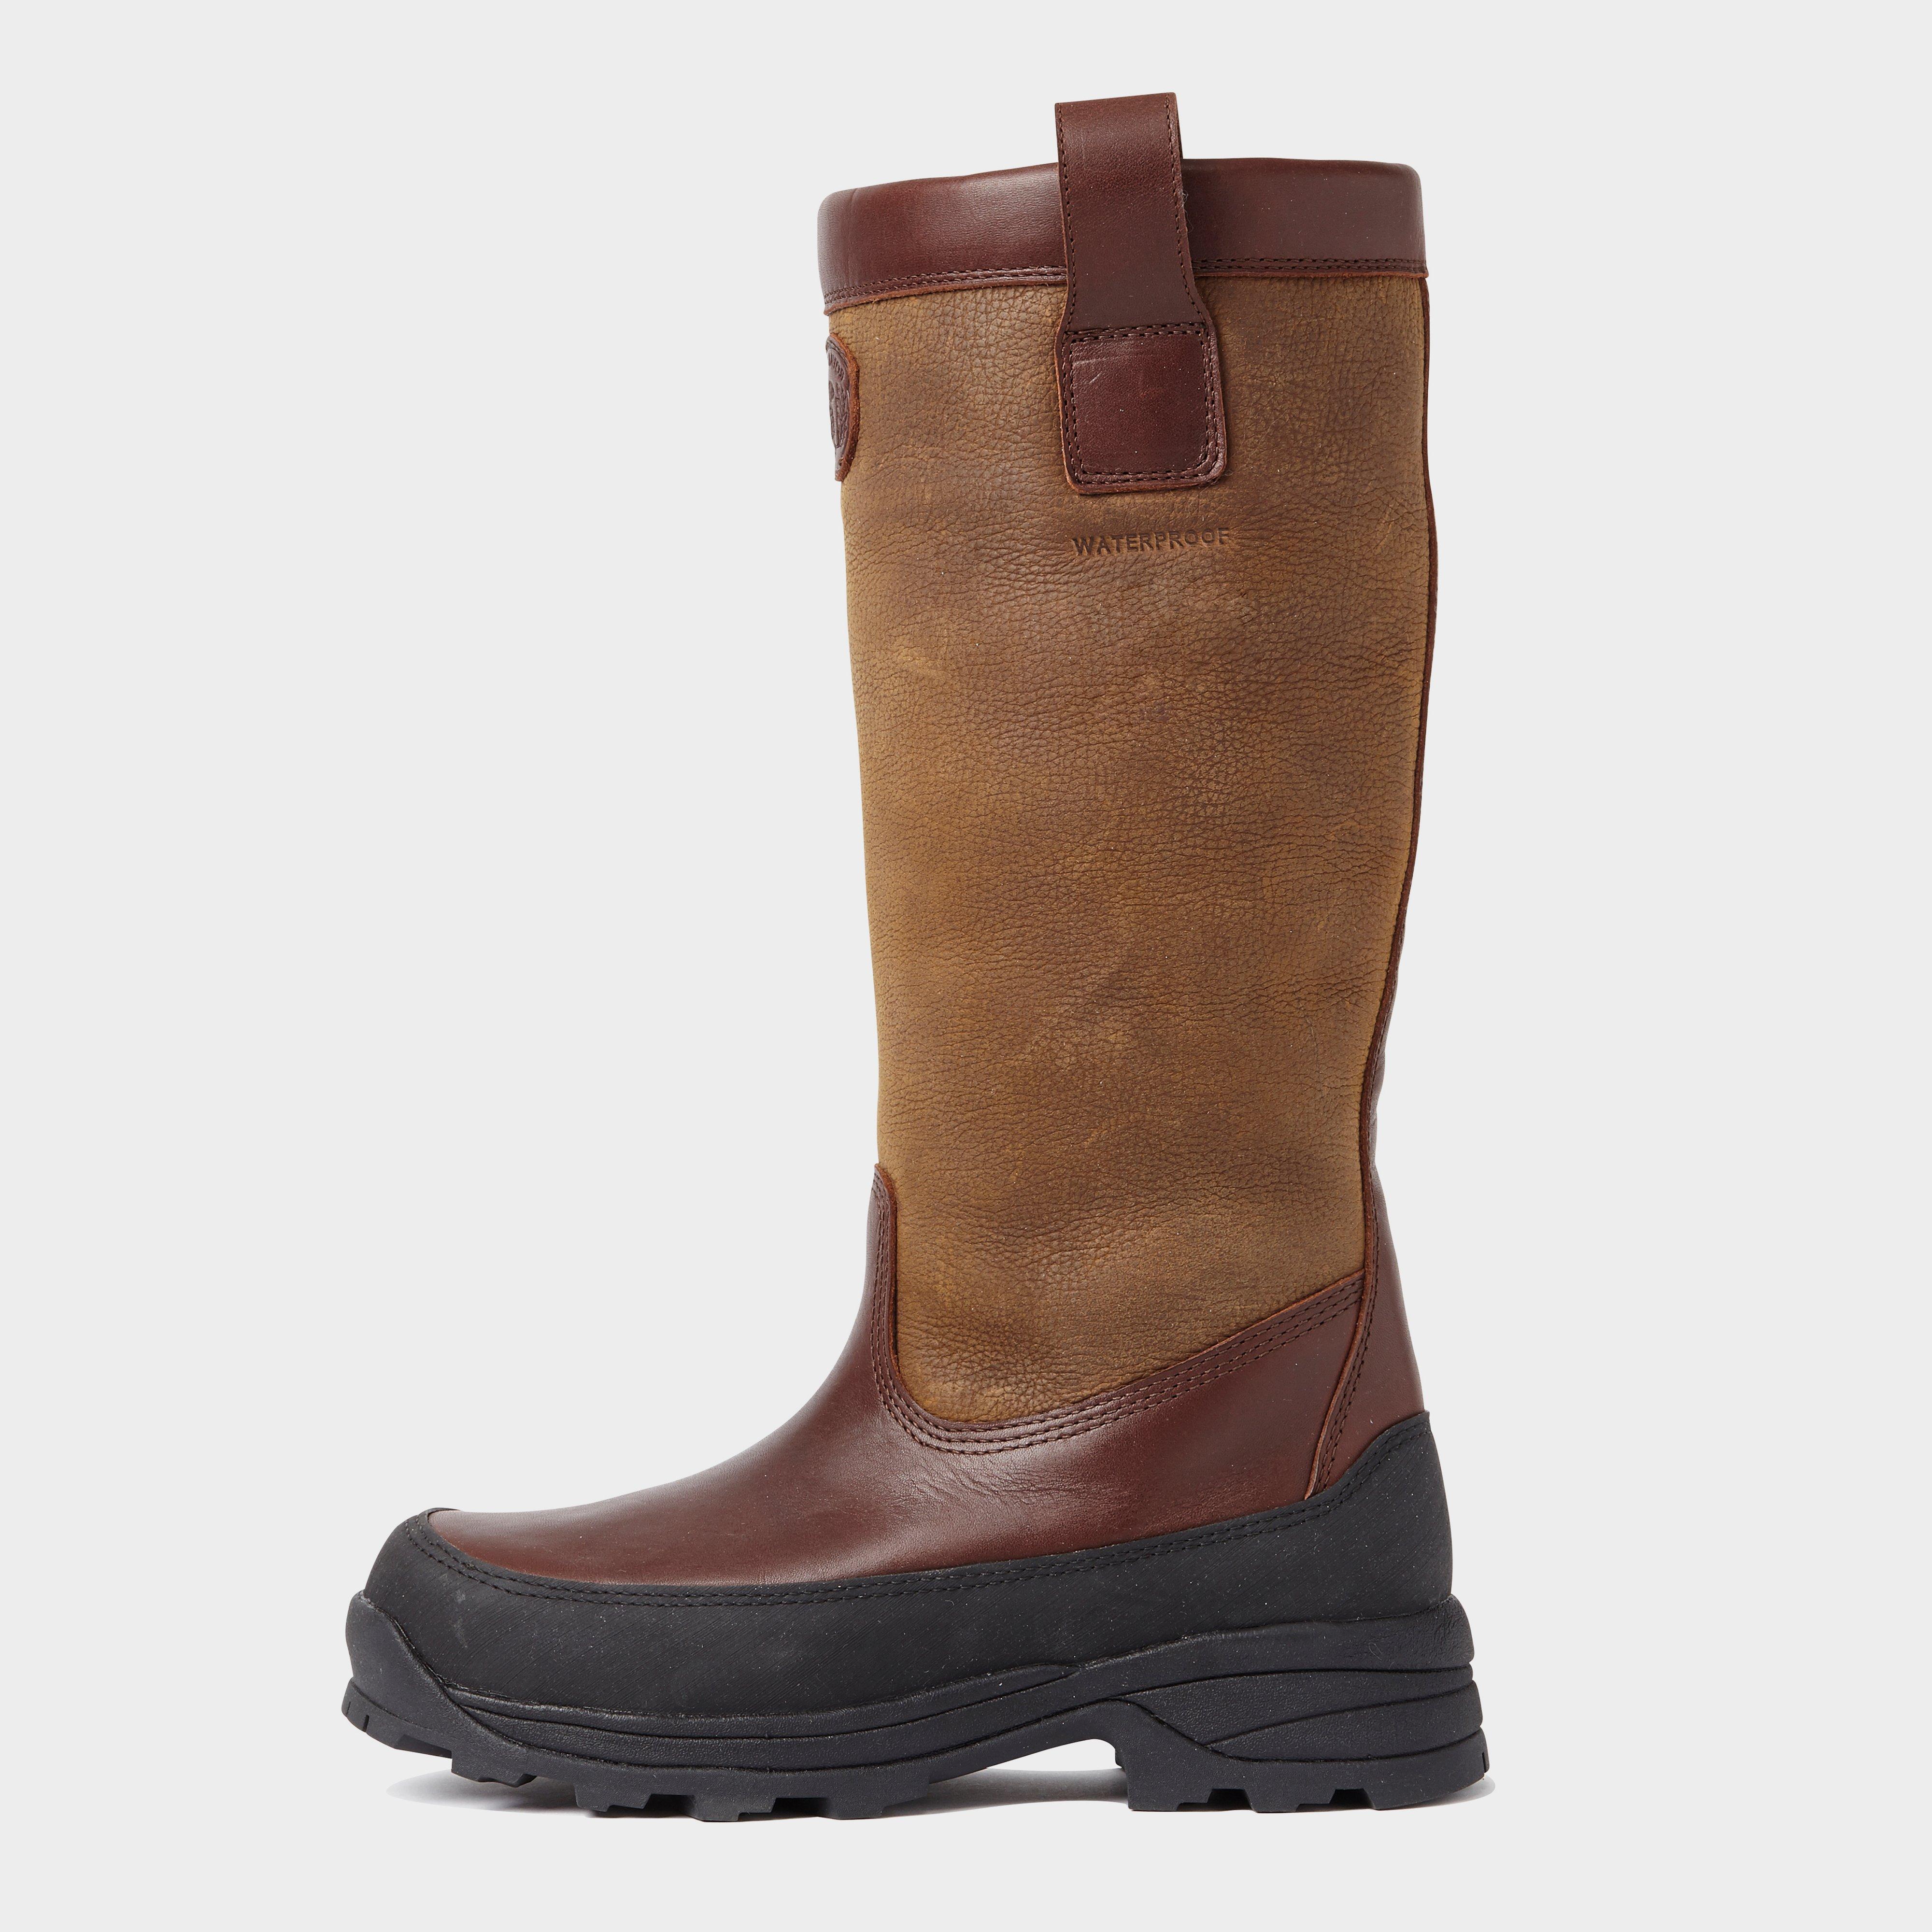 Royal Scot Women's Glencoe Boot - Brown/Brown, Brown